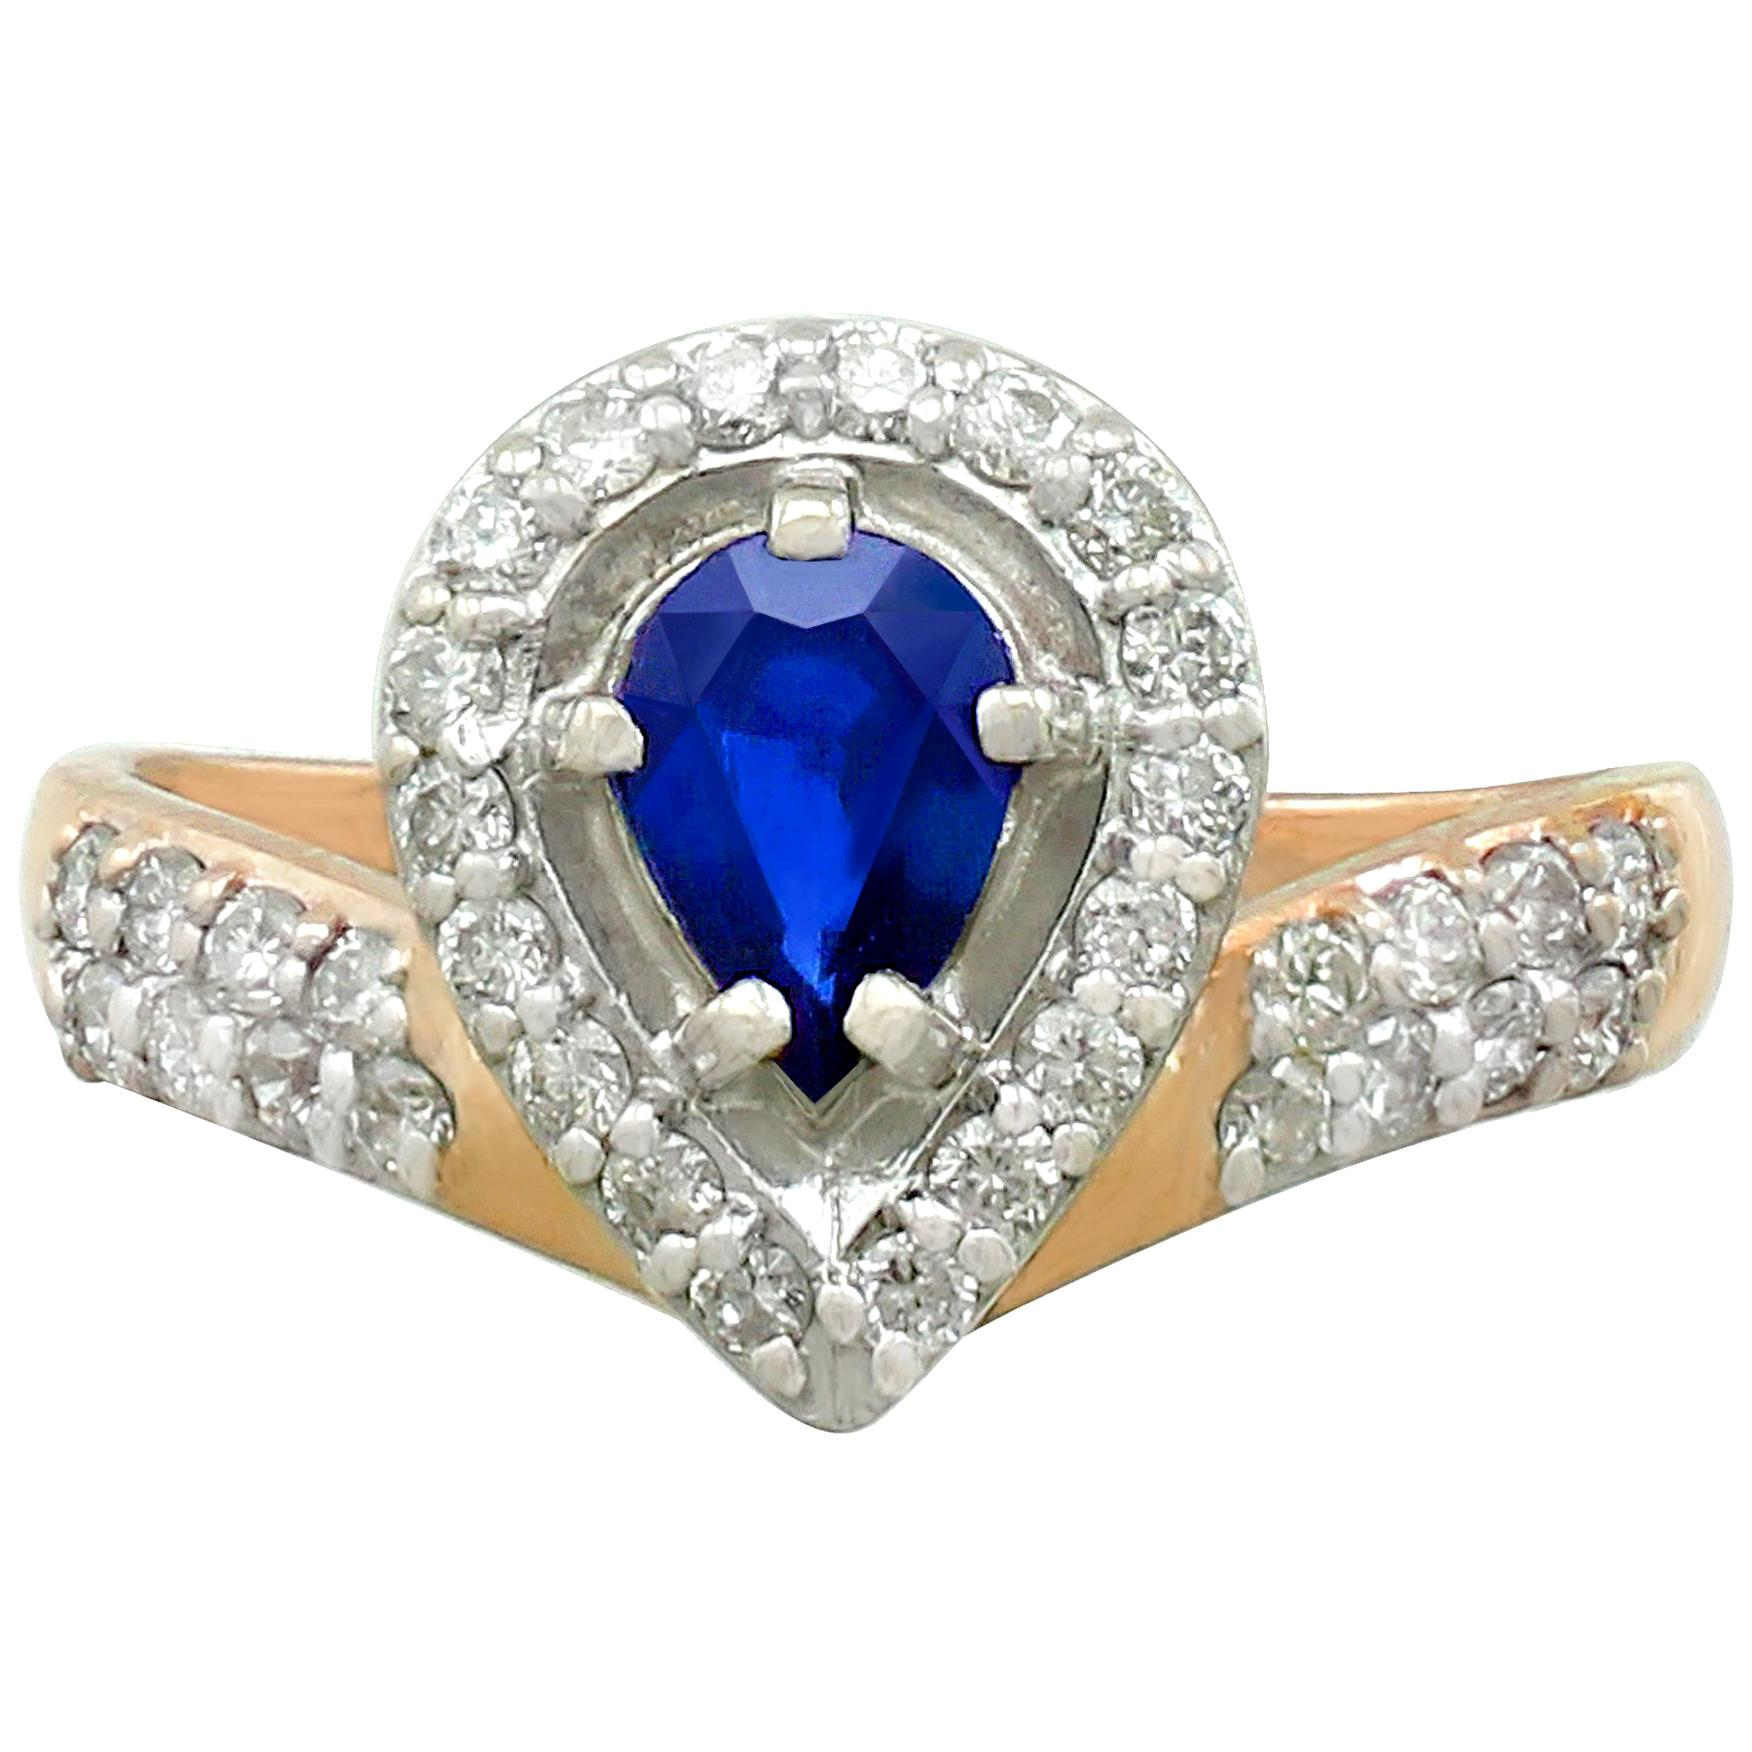 77d4a5cb44df3 Unique Georgian Era Pear Shaped Rose Cut Diamond Silver Topped Gold Ring